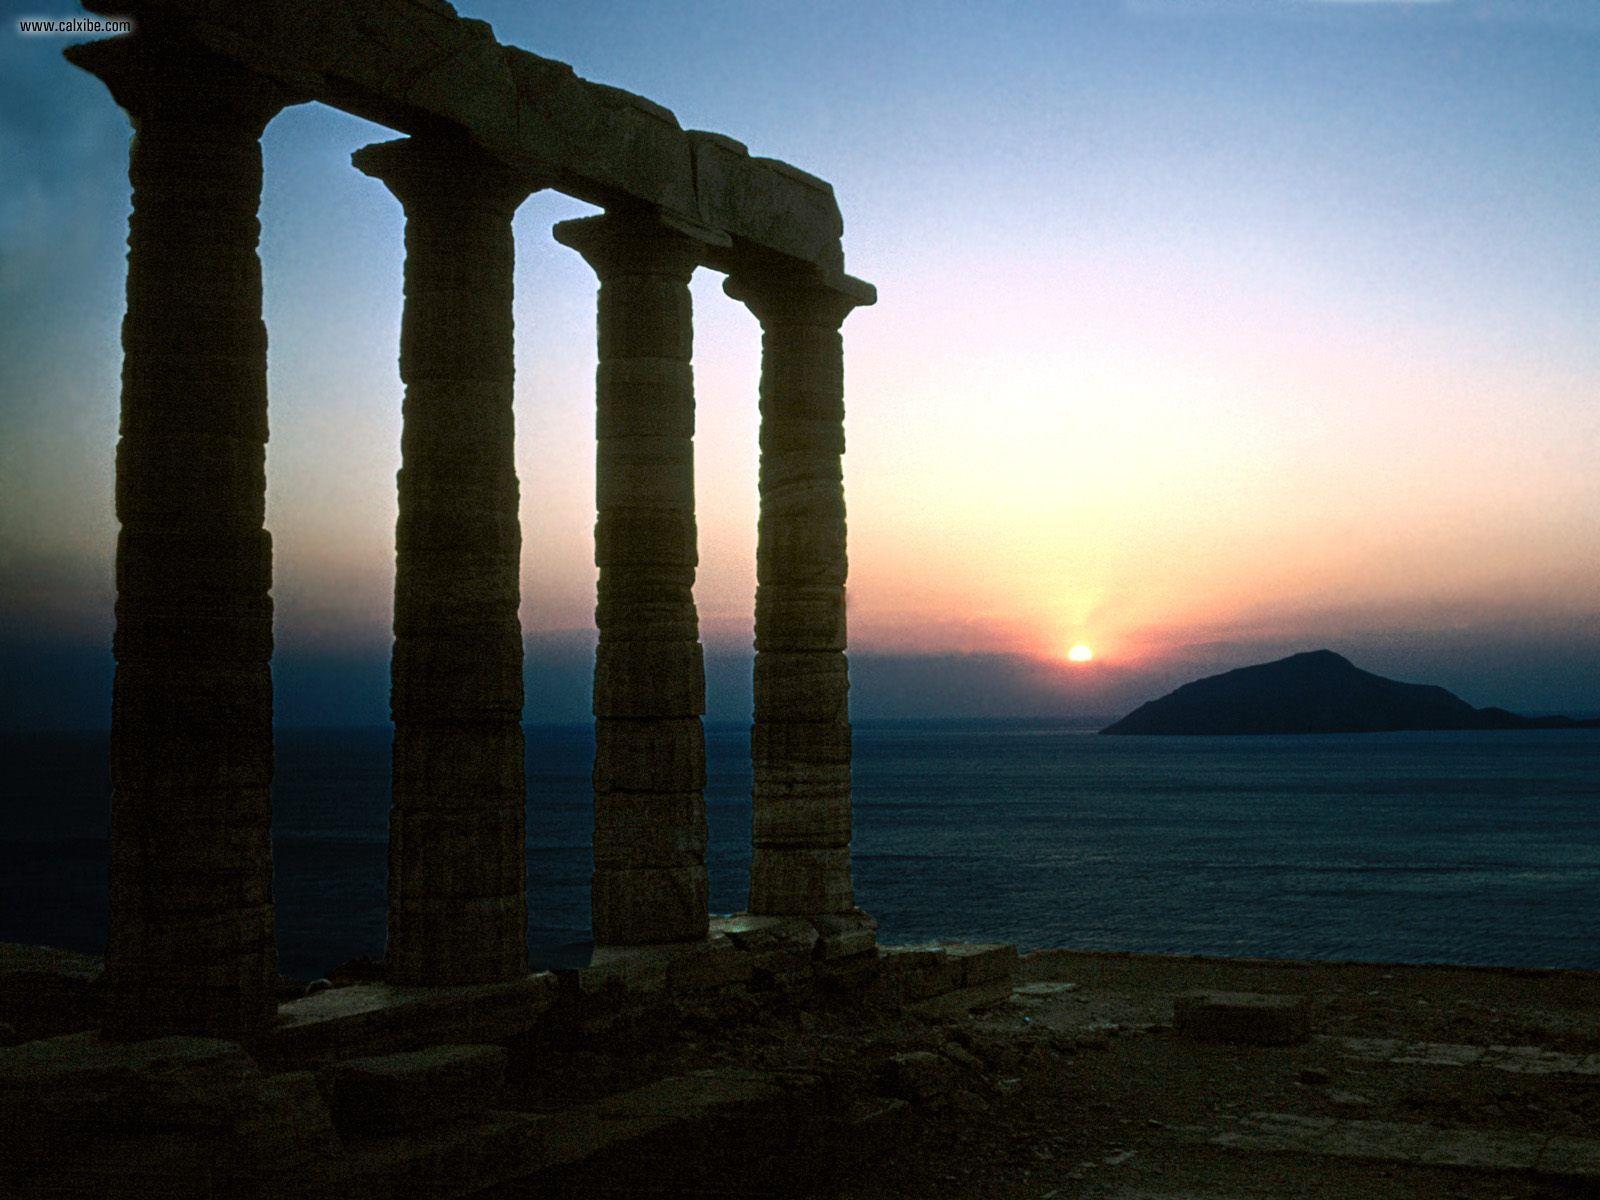 sunset-ruins-seas-hills-Greece-roman-empire-palace-Sounion-Cape-x-wallpaper-wp429458